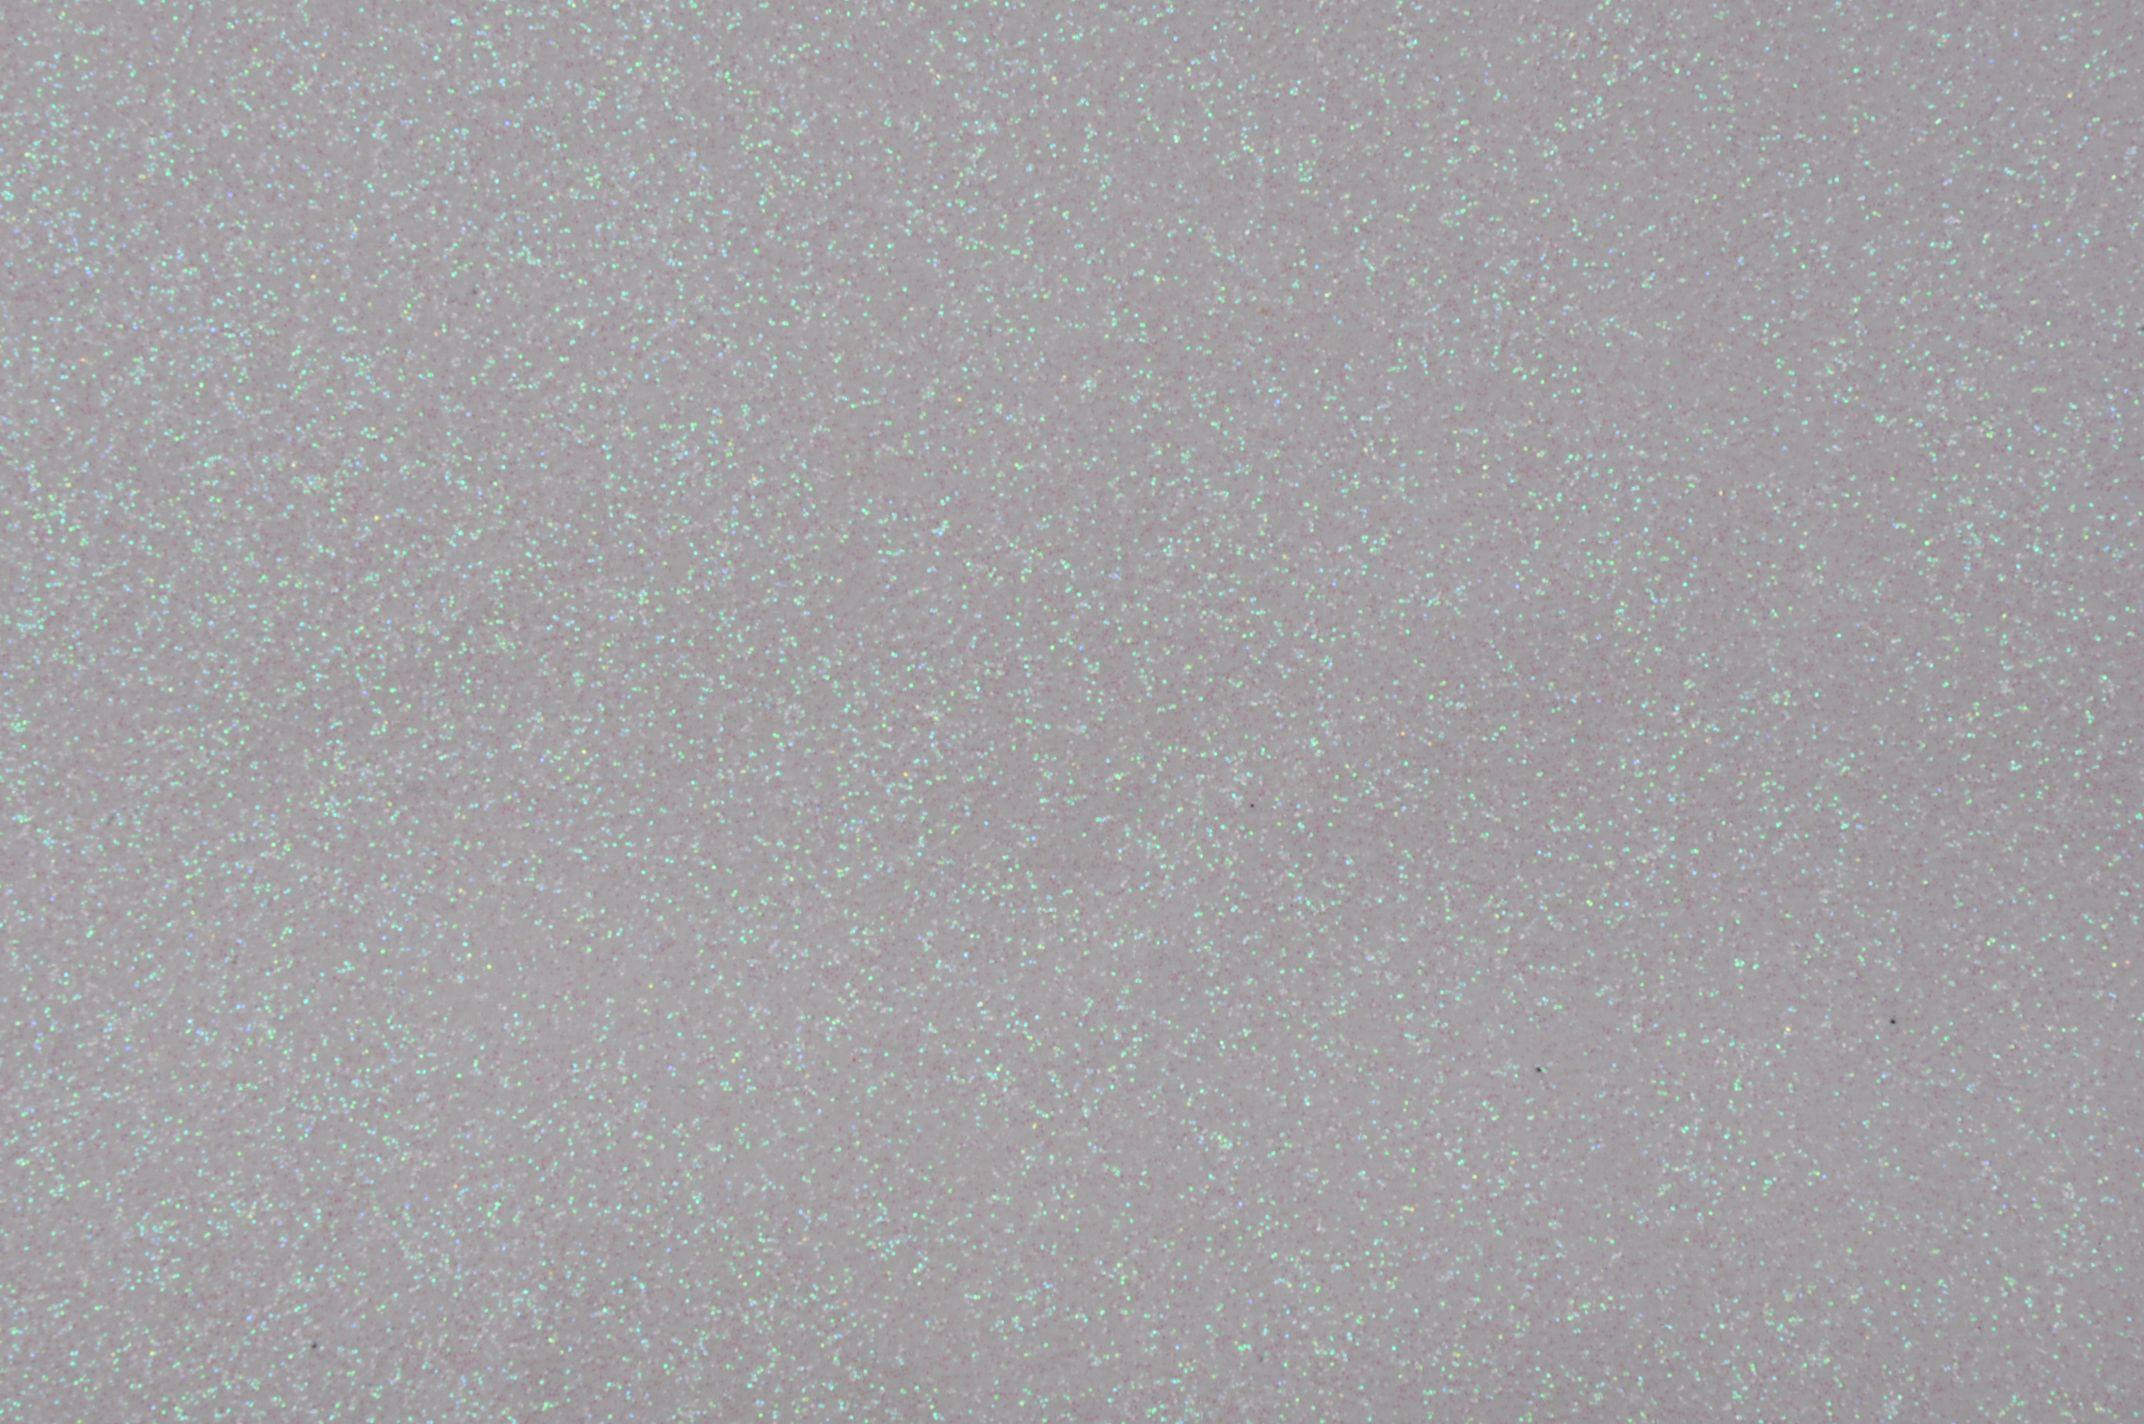 Jc Pack Eco Friendly Purple Glitter Wall Paper Black Glitter